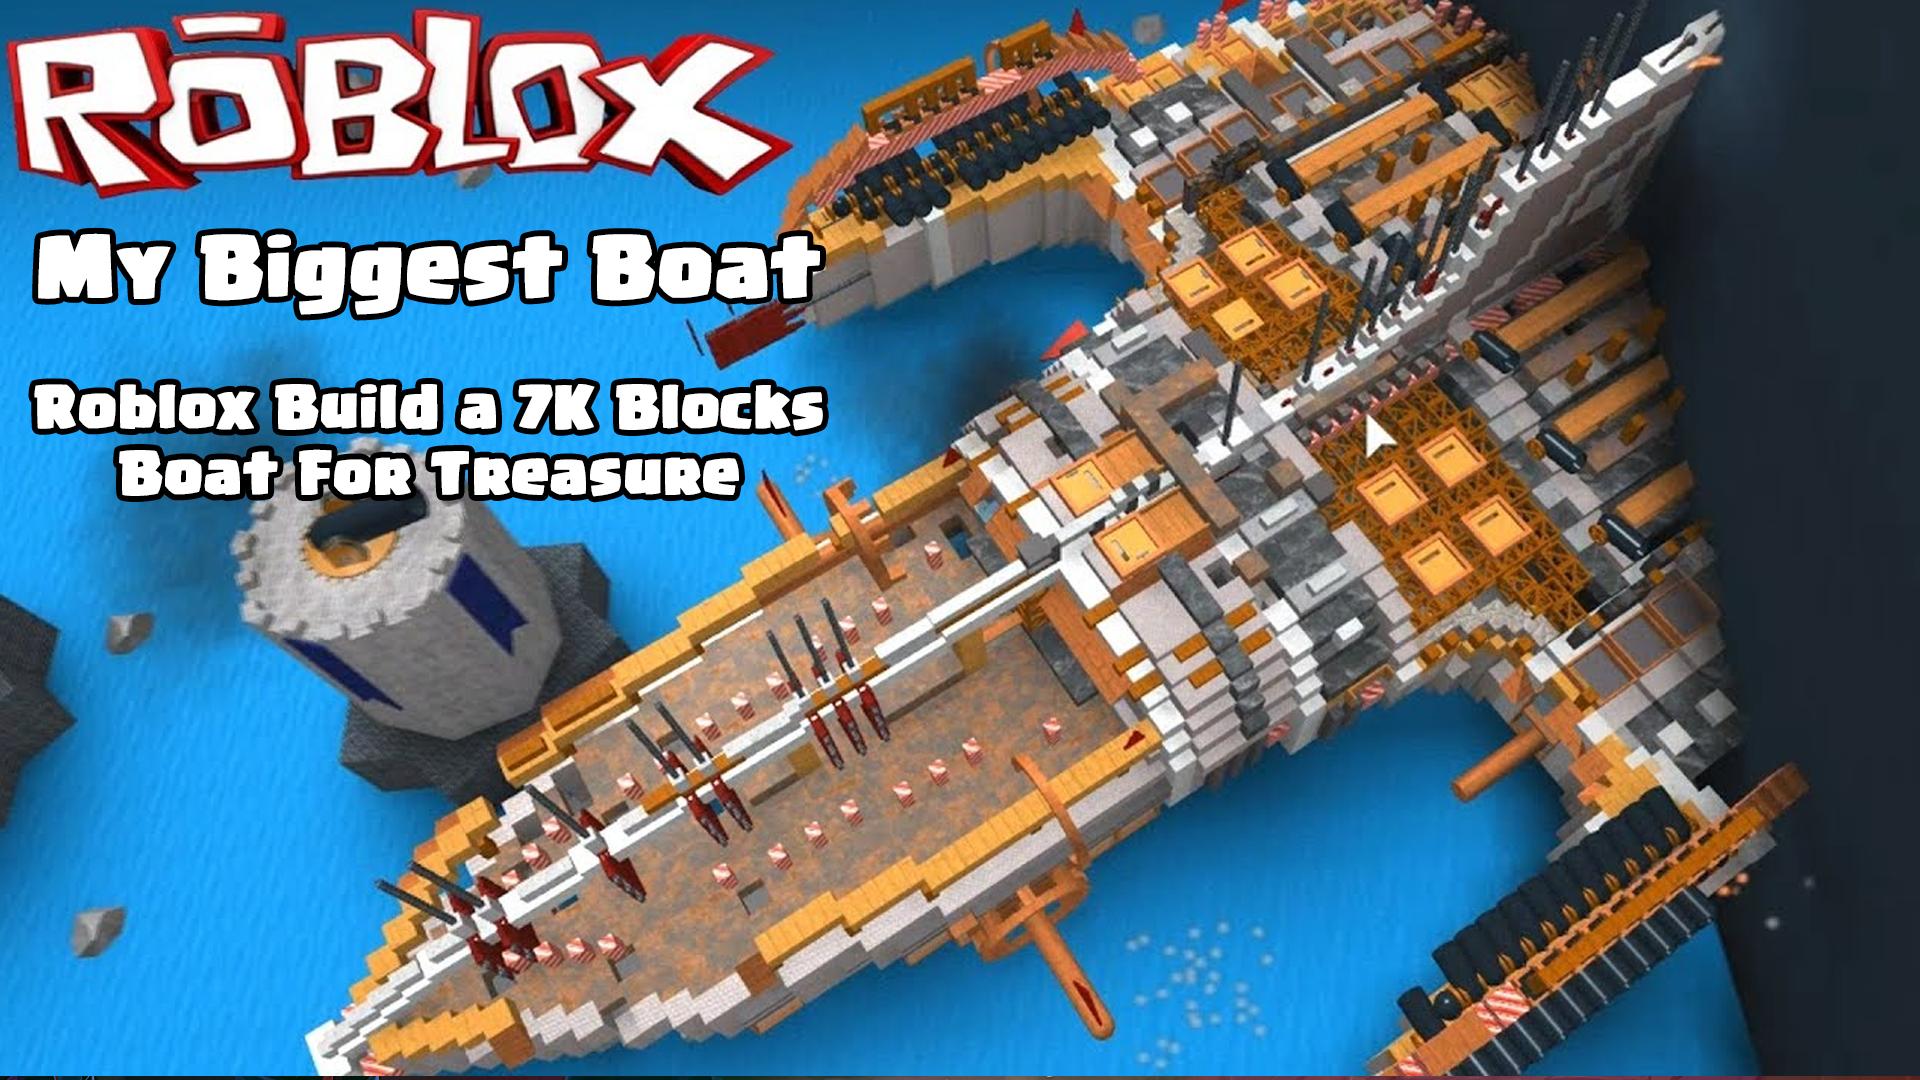 Watch Clip Roblox Titan Simulator Gameplay Prime Video - roblox build a boat for treasure game simulator our family